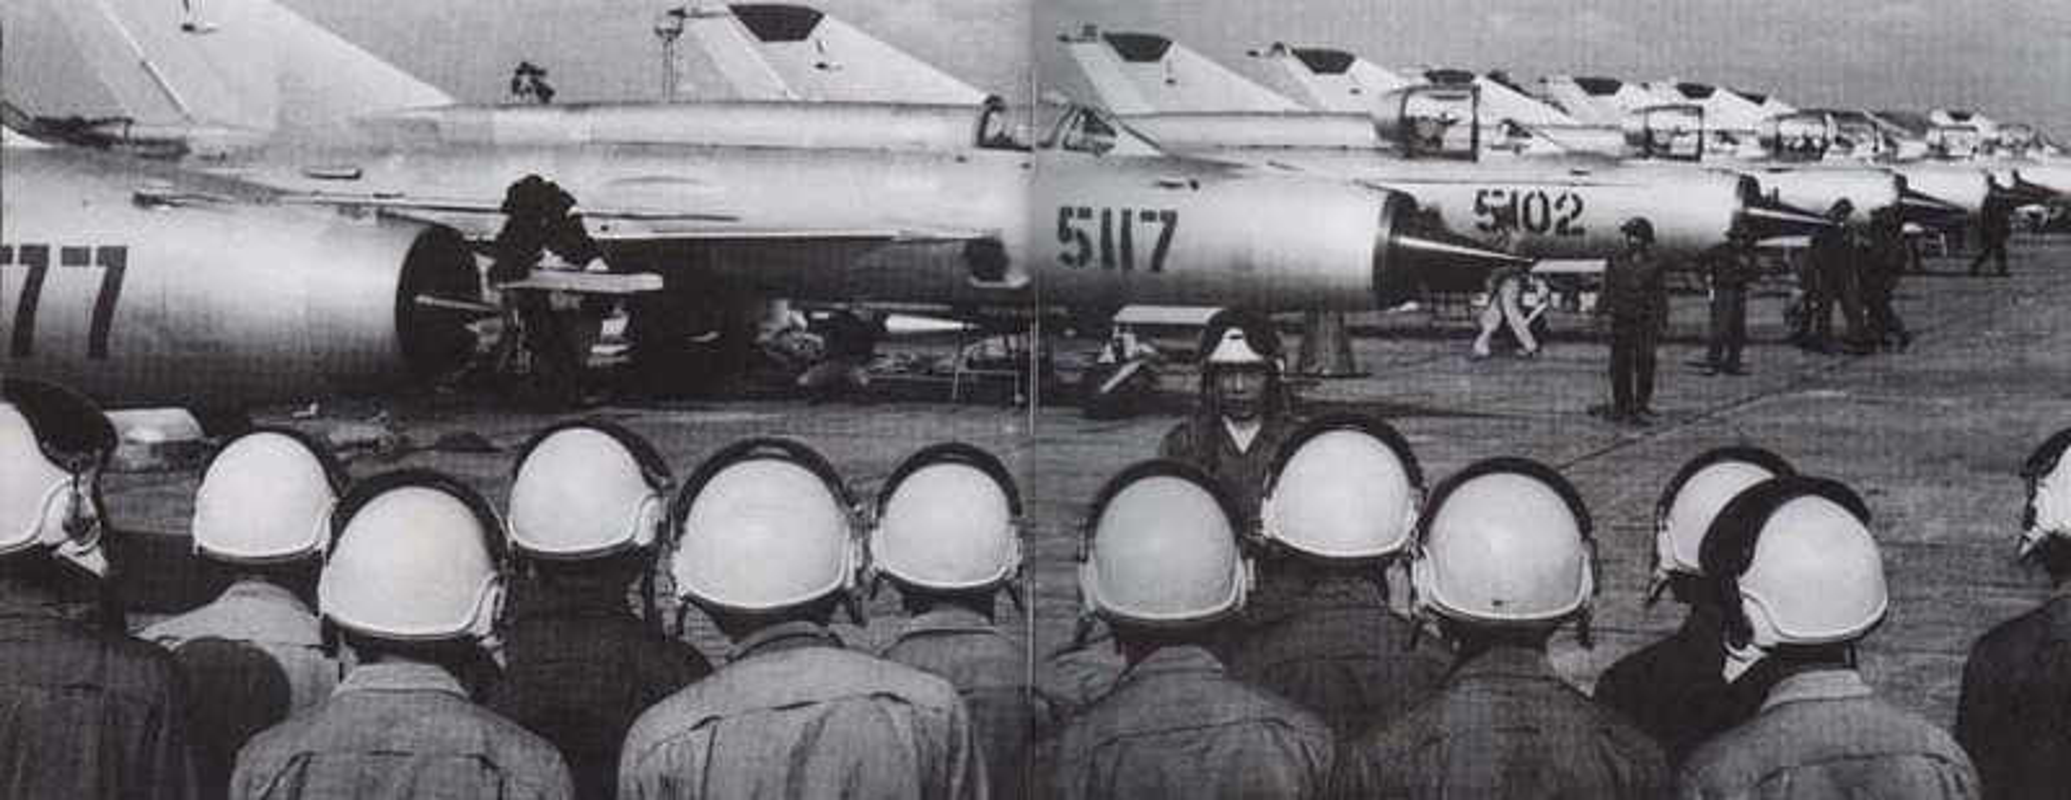 MiG-21 cua phi cong Pham Tuan da vuot mat F-4 de ha B-52 ra sao?-Hinh-3